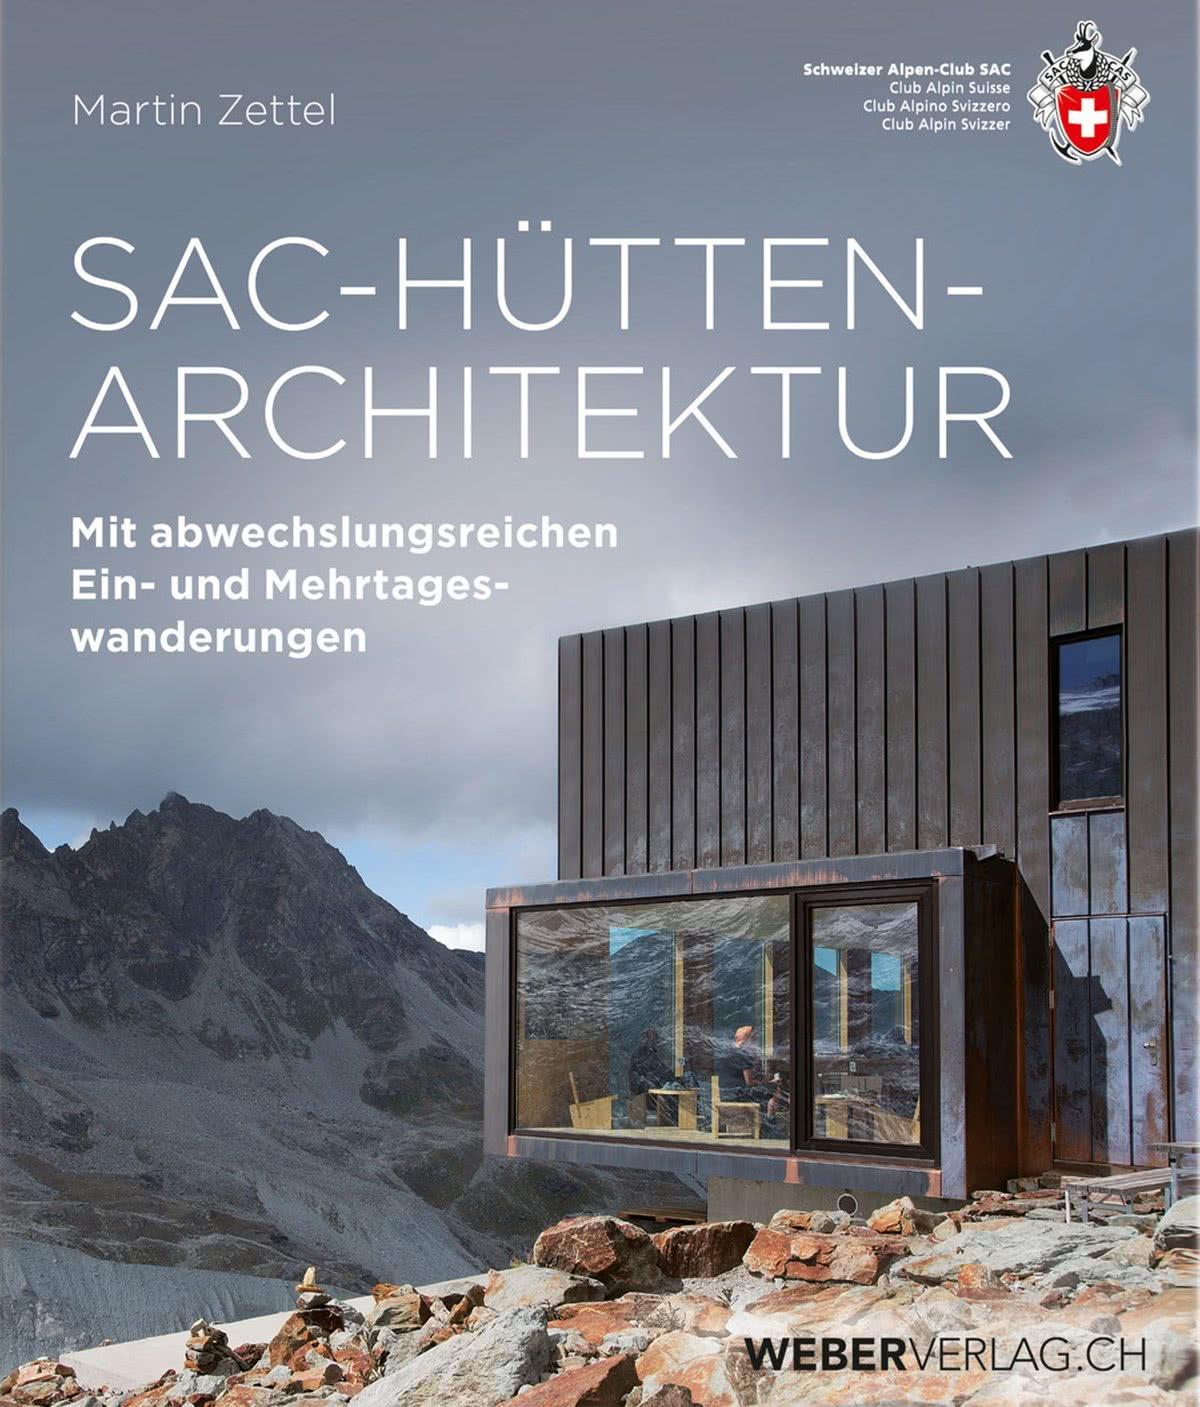 SAC-Hüttenarchitektur-M_Zettel